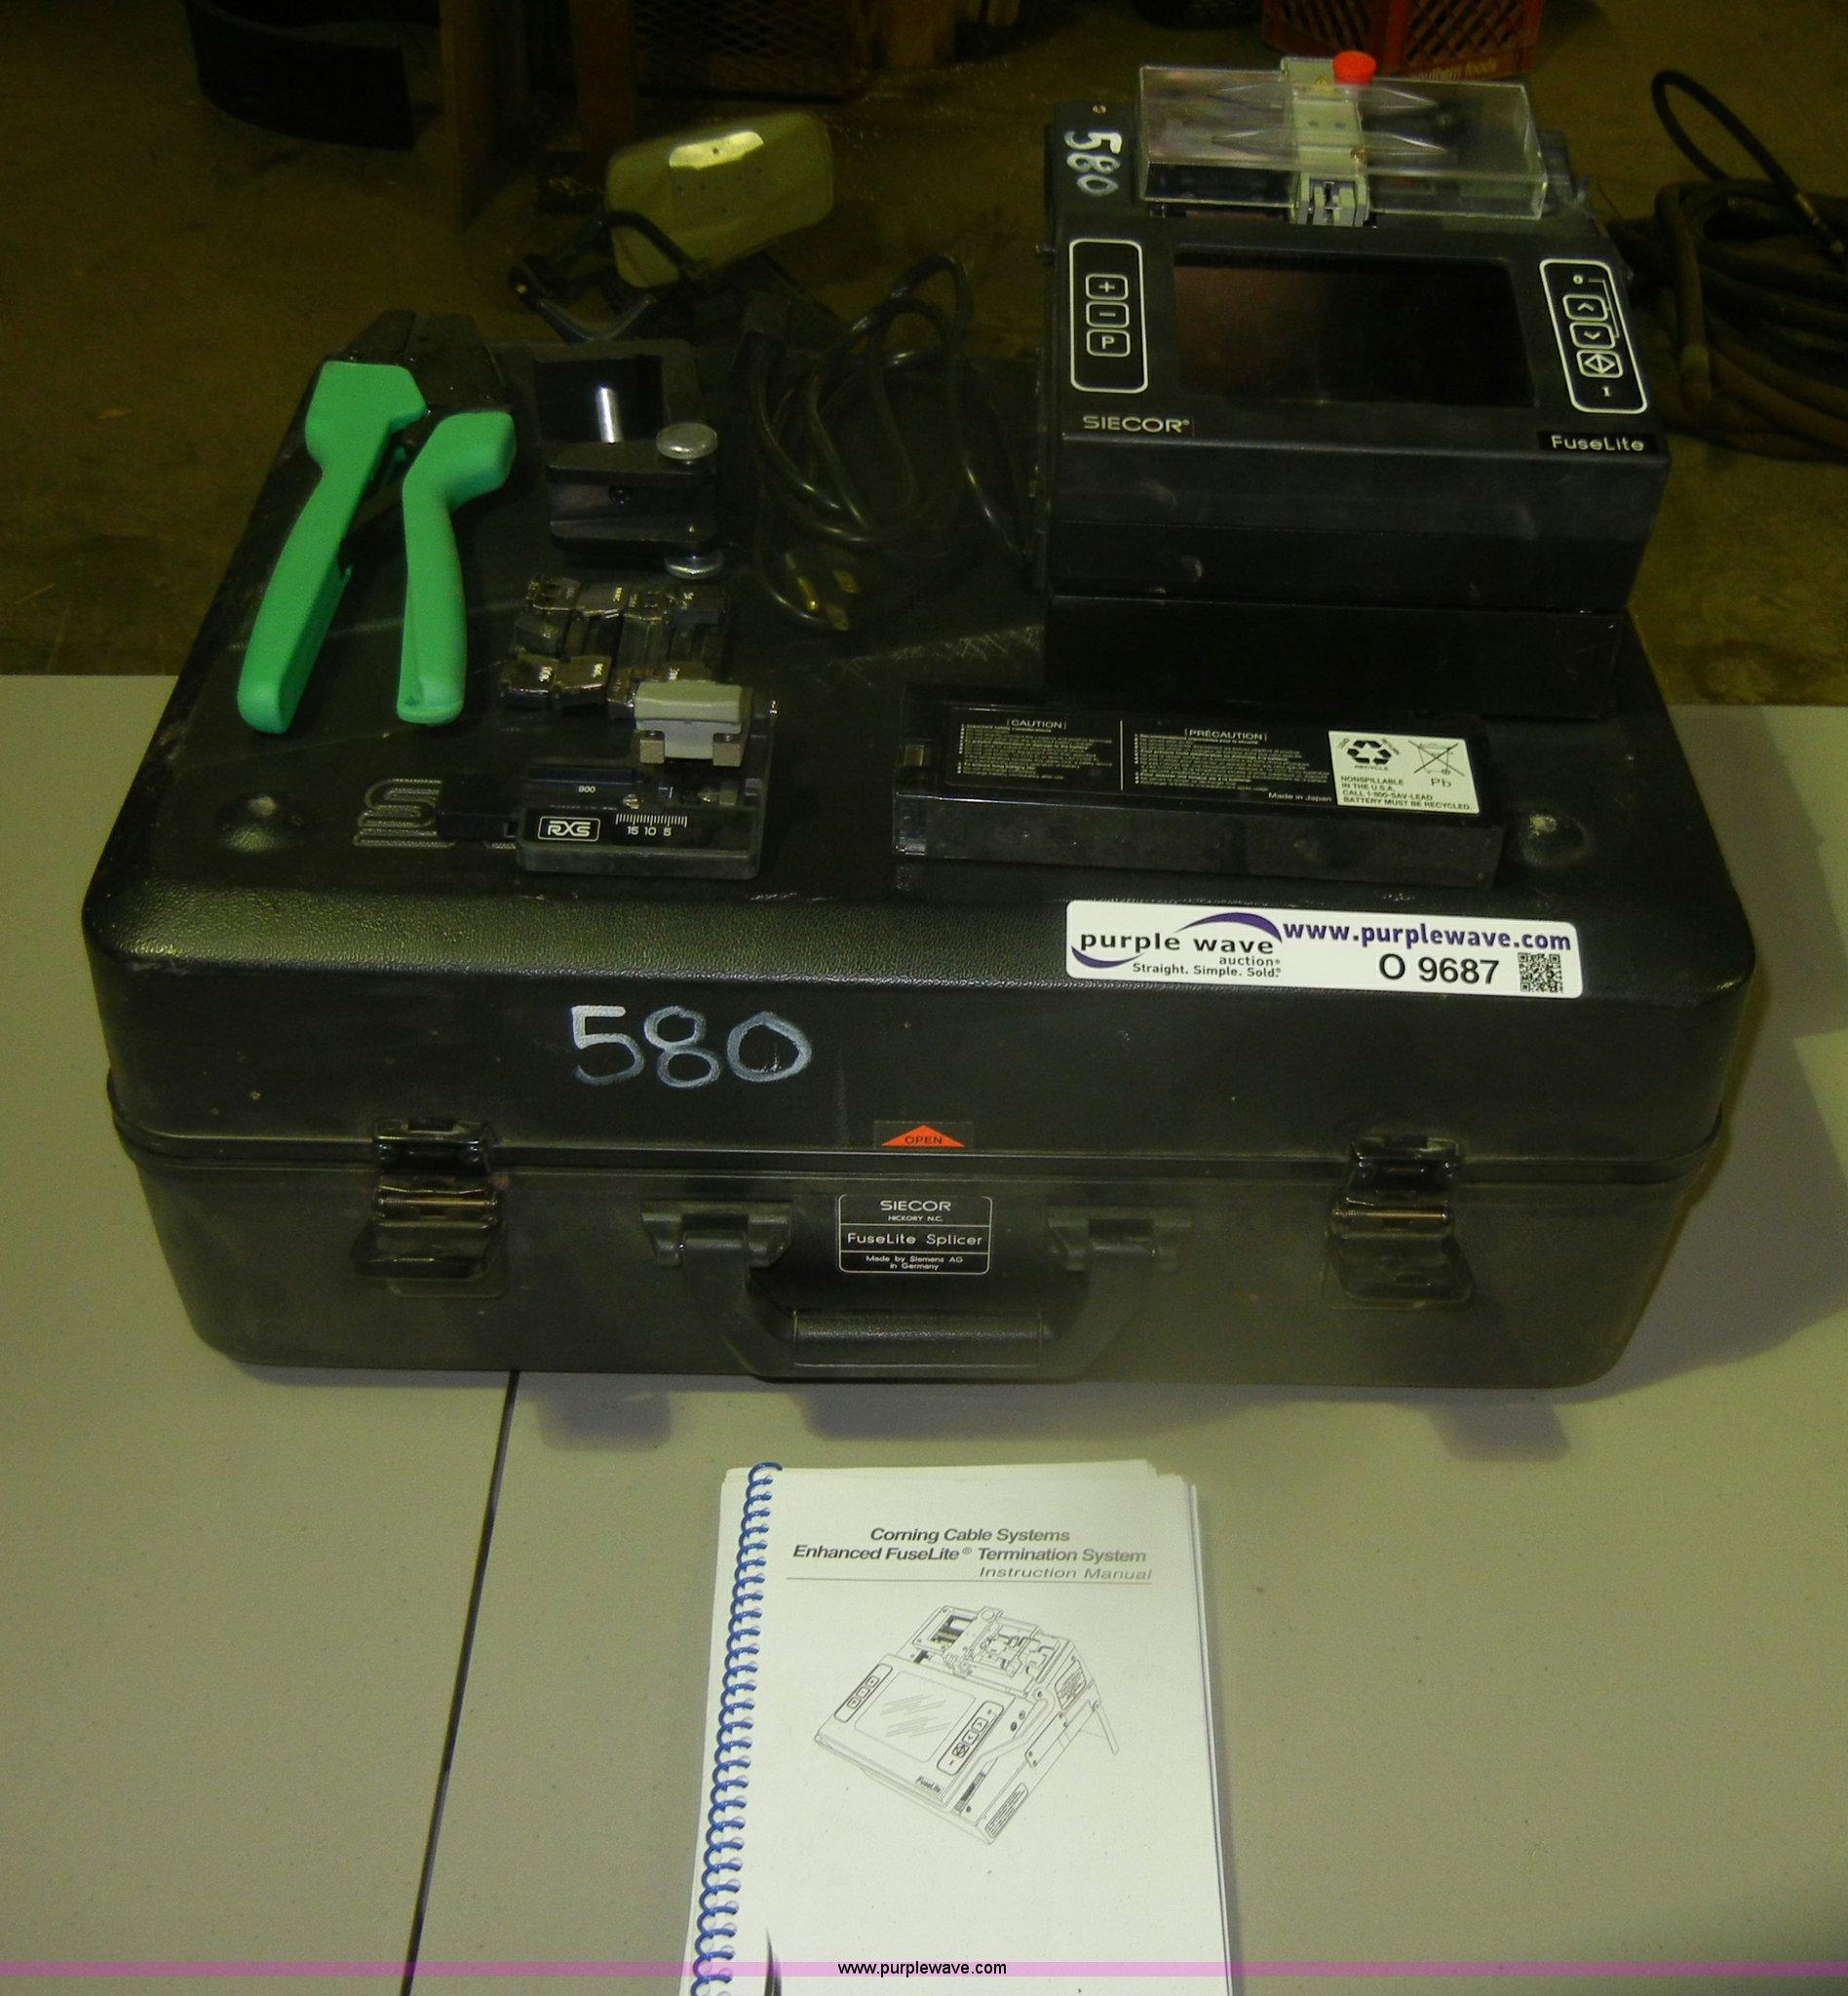 Siecor Fuse Lite splicer | Item O9687 | 12-6-2012